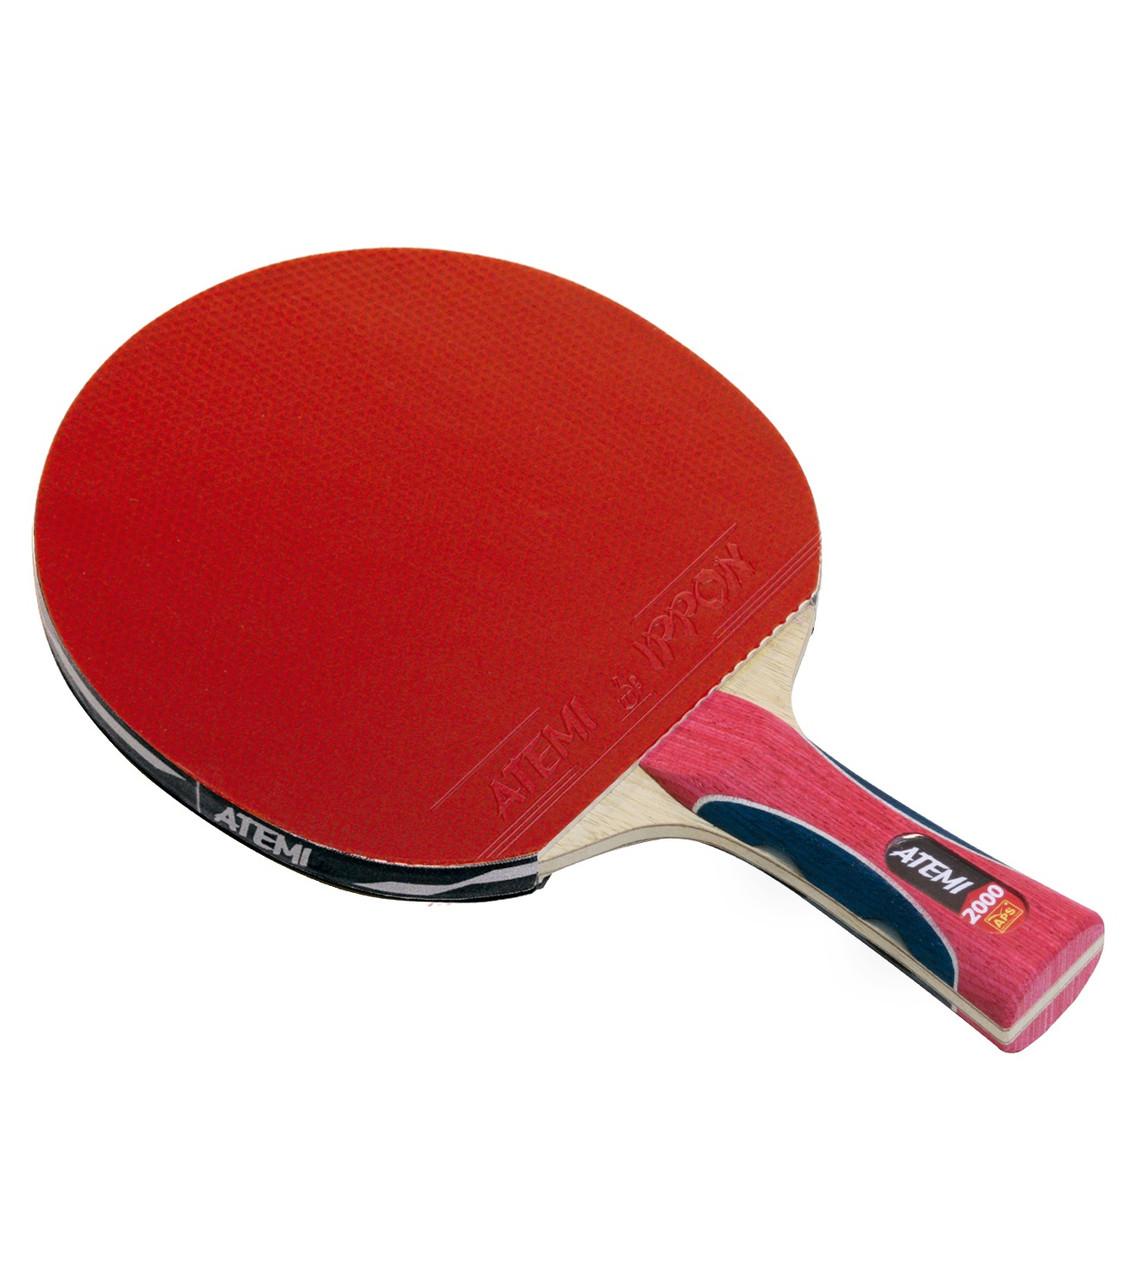 Ракетка для настольного тенниса ATEMI PRO 2000A